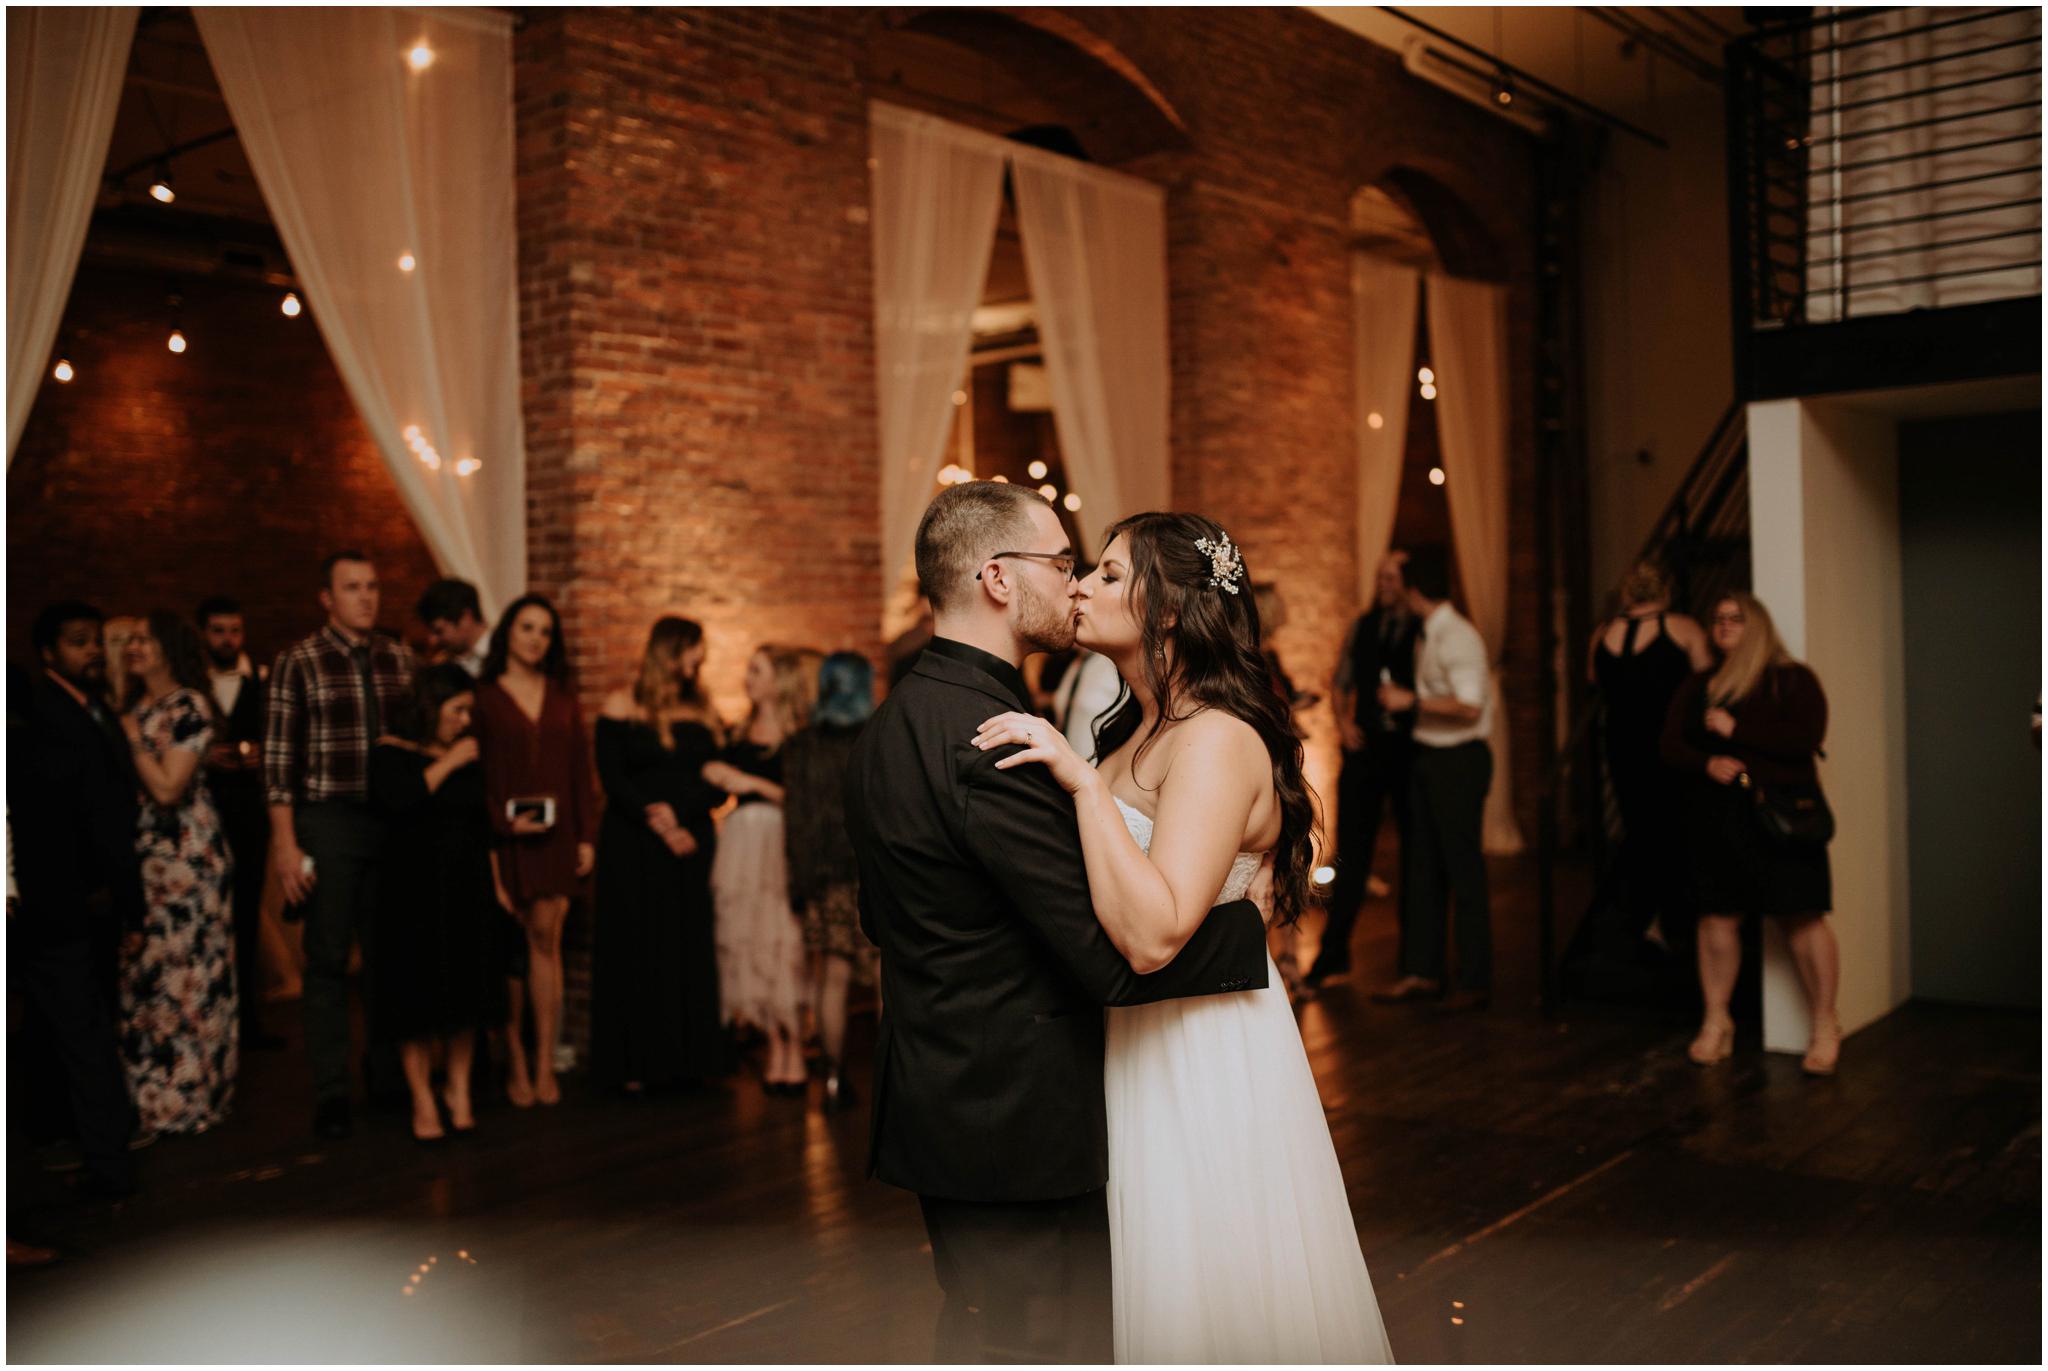 danny+mackenzie+downtown-seattle-axis-wedding-seattle-photographer-111.jpg